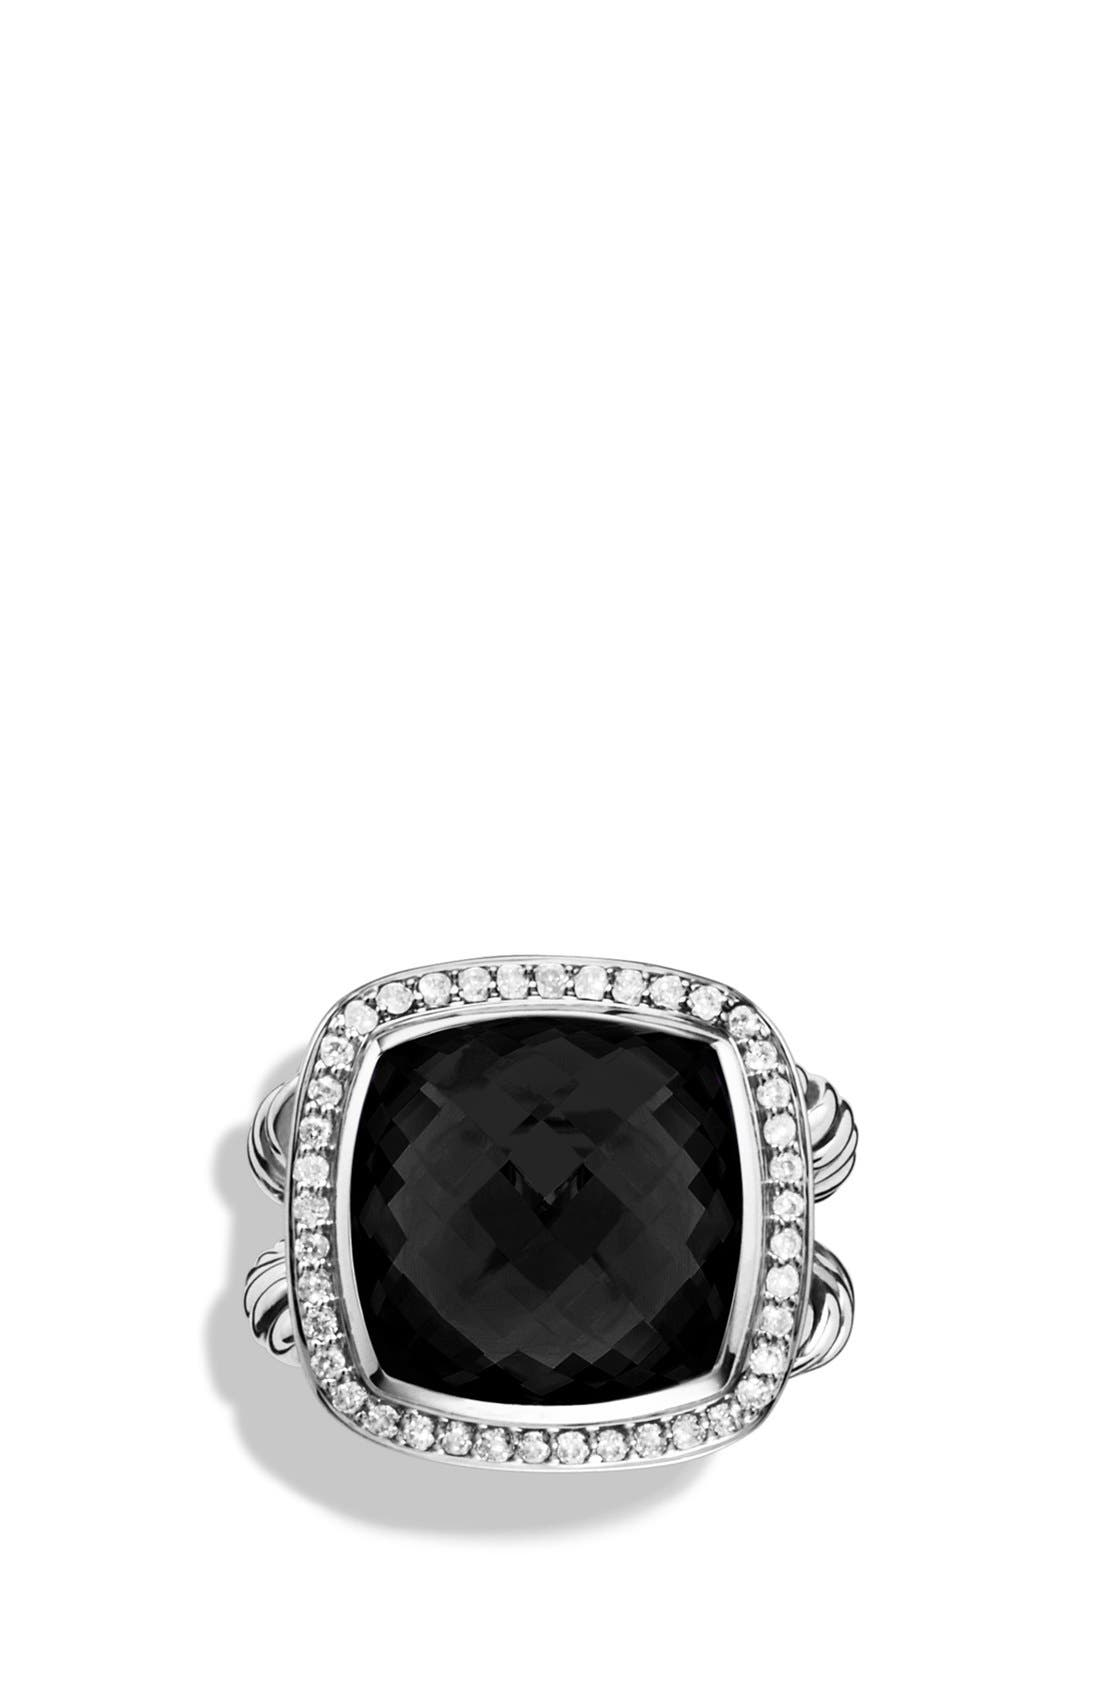 'Albion' Ring with Semiprecious Stone & Diamonds,                             Alternate thumbnail 4, color,                             001